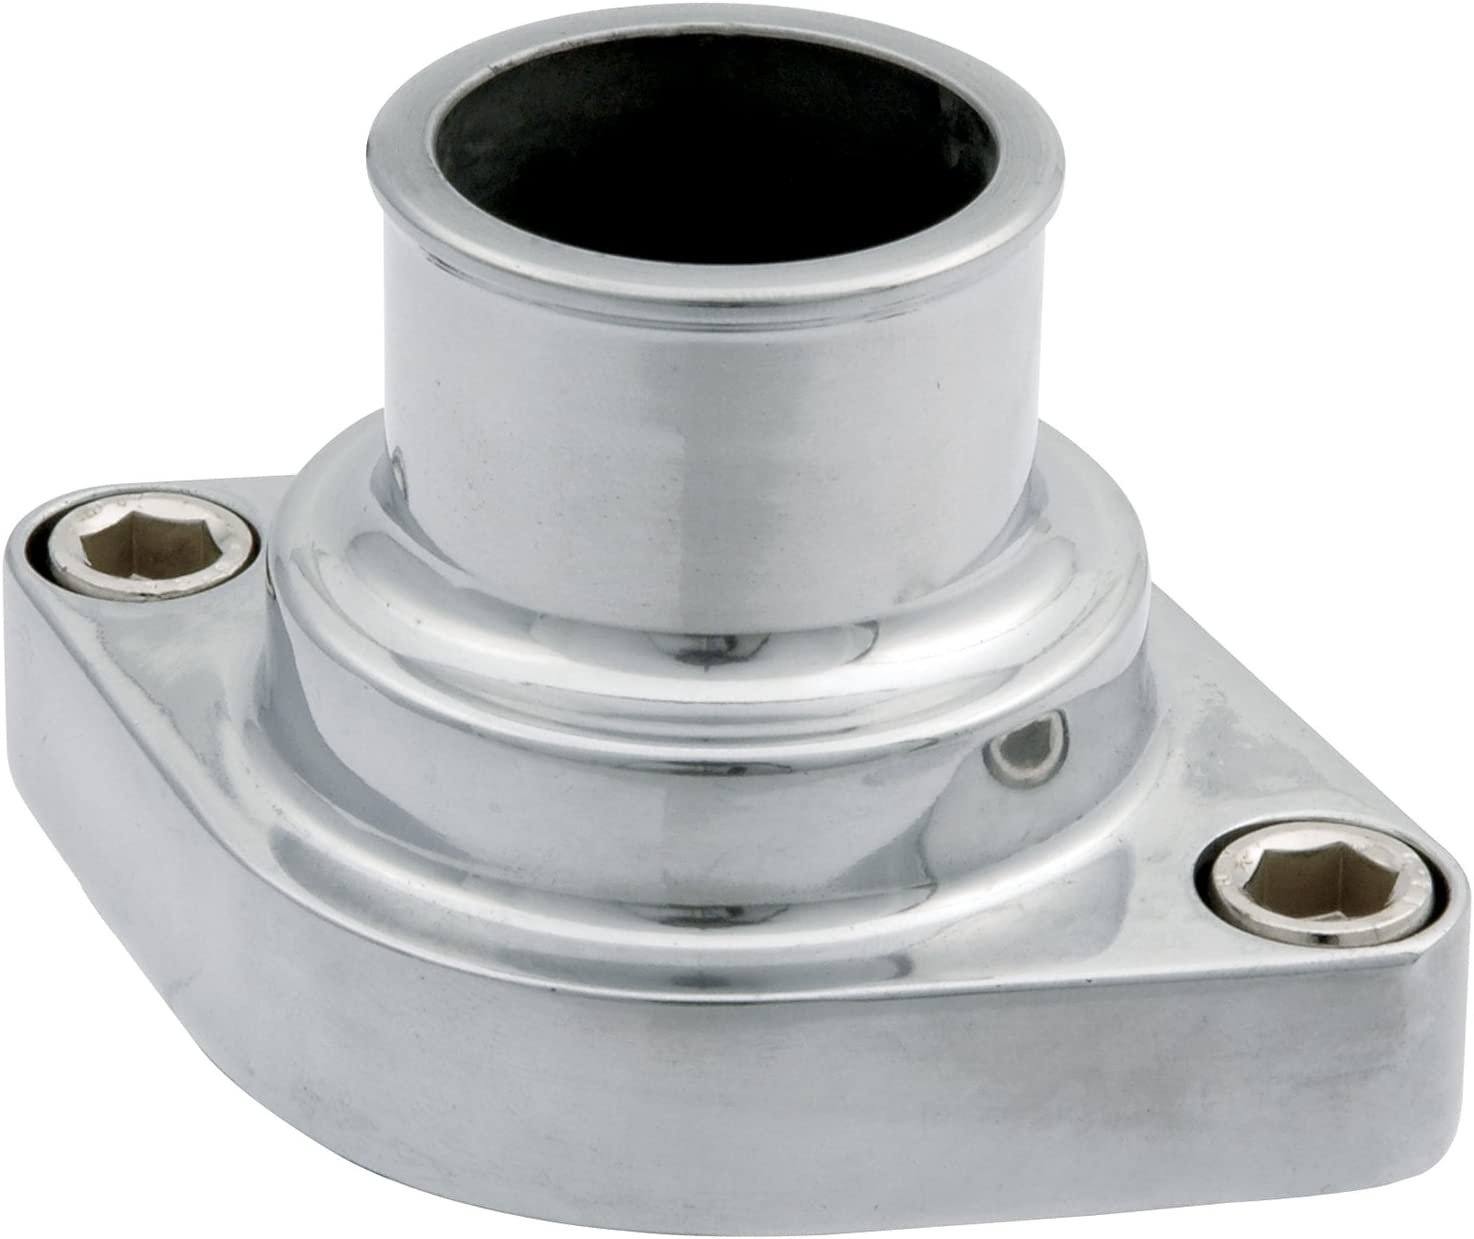 Allstar Performance ALL30170 90 Degree Aluminum Water Neck